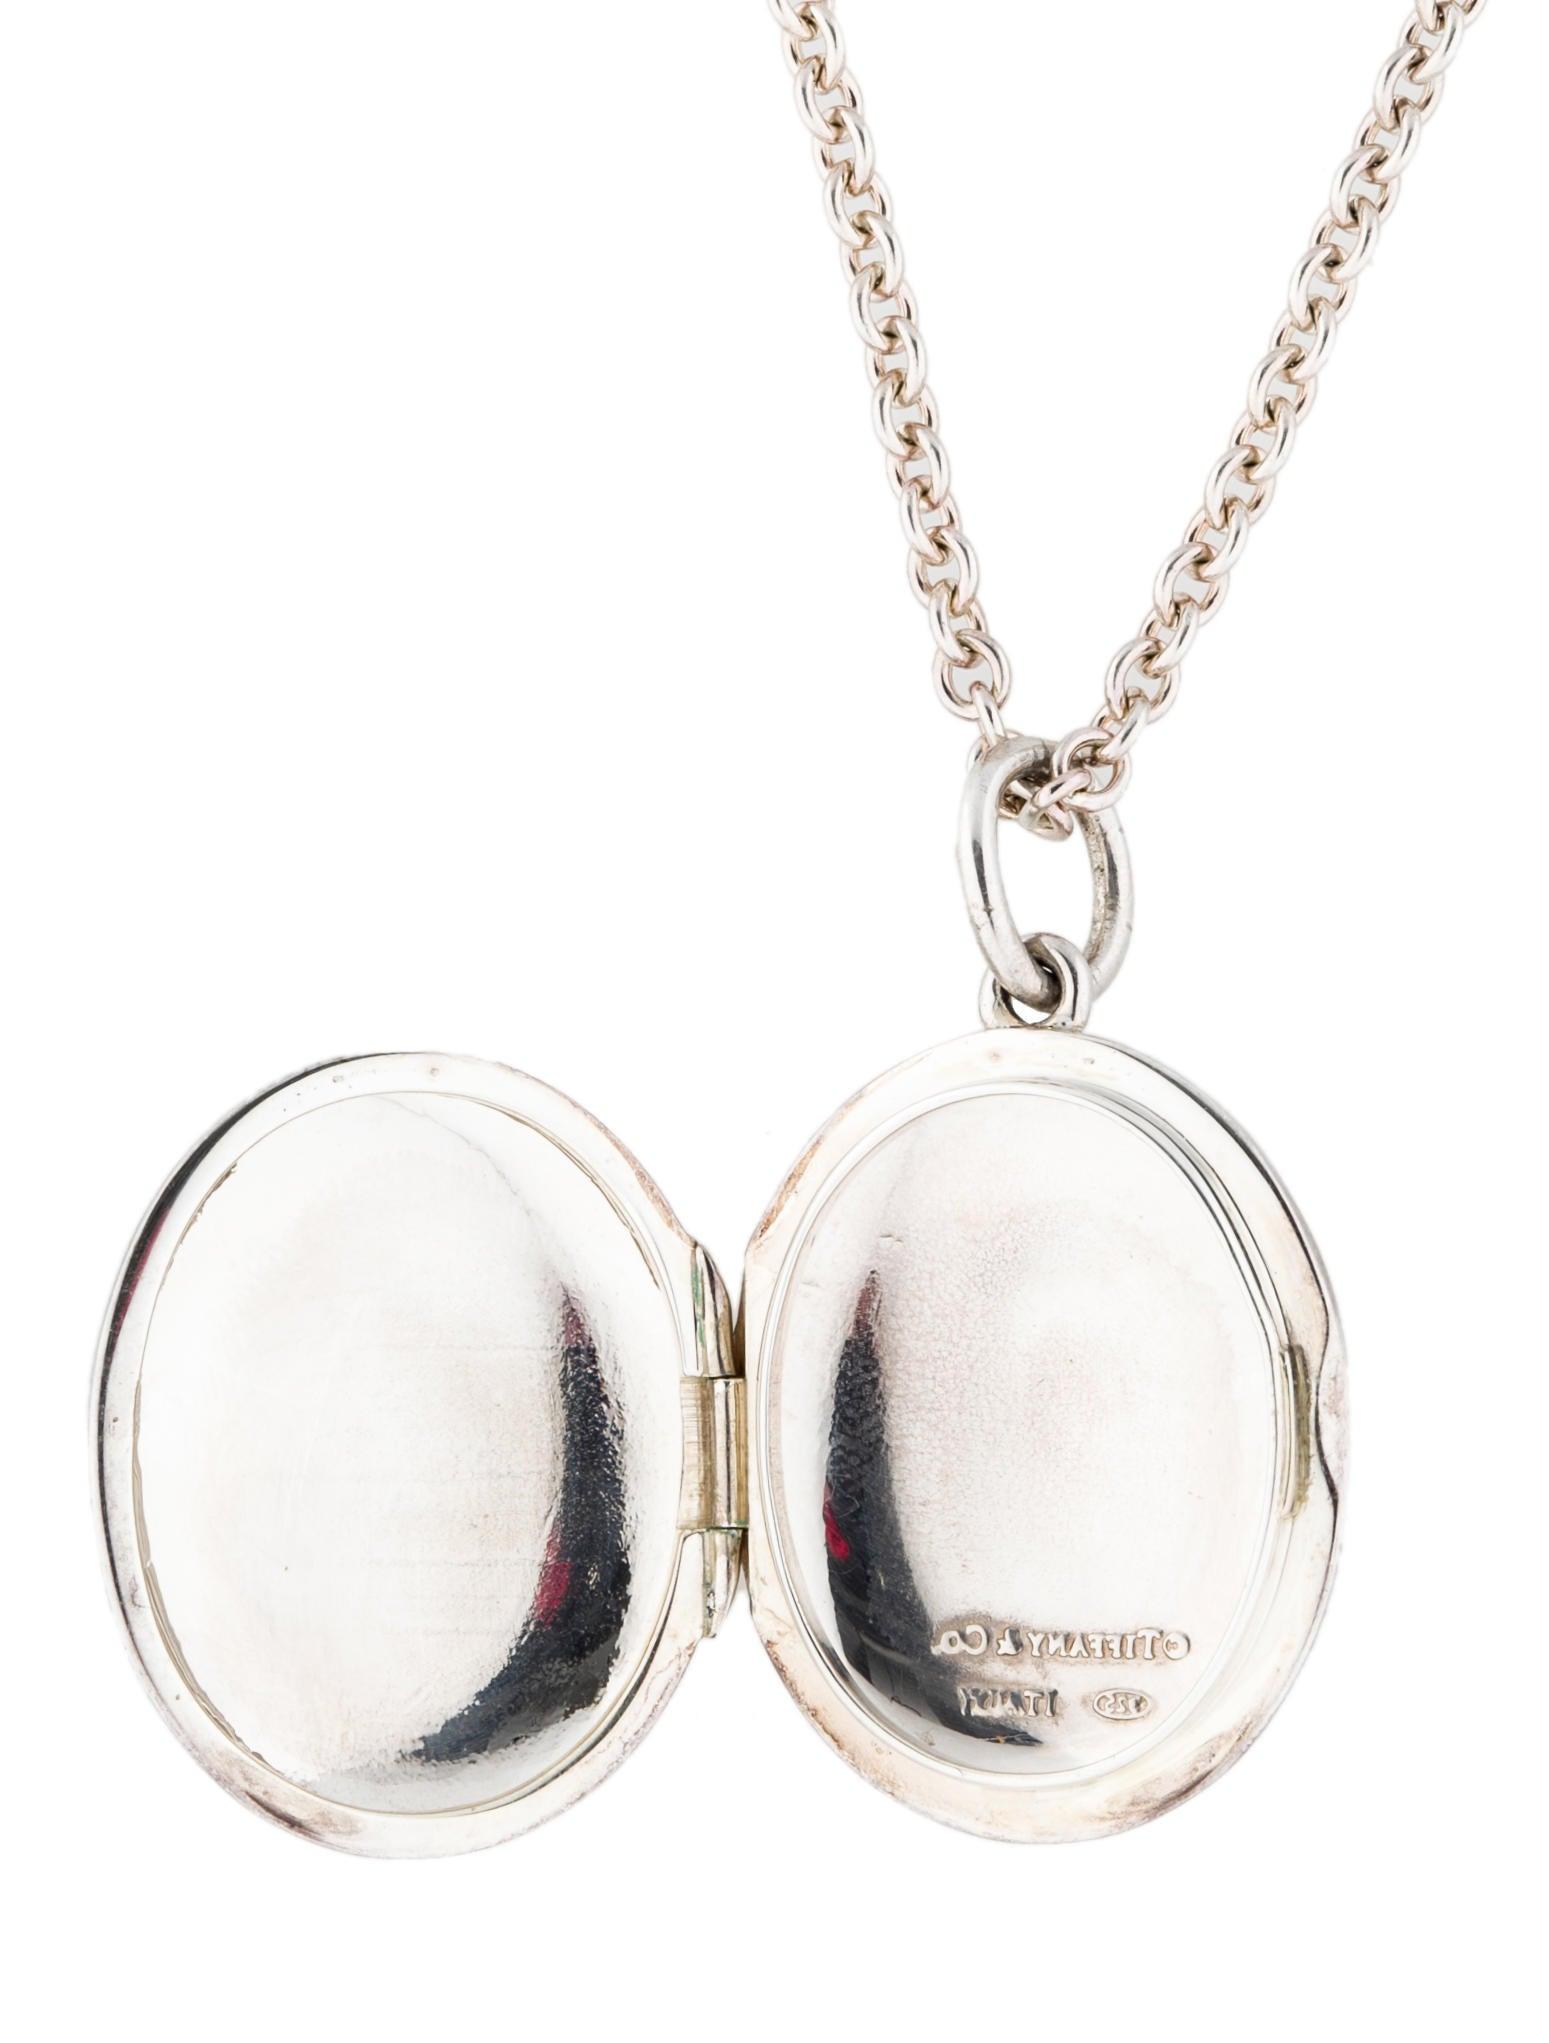 Heart locket in sterling silver, large. Tiffany Co Tiffany locket photo sizer